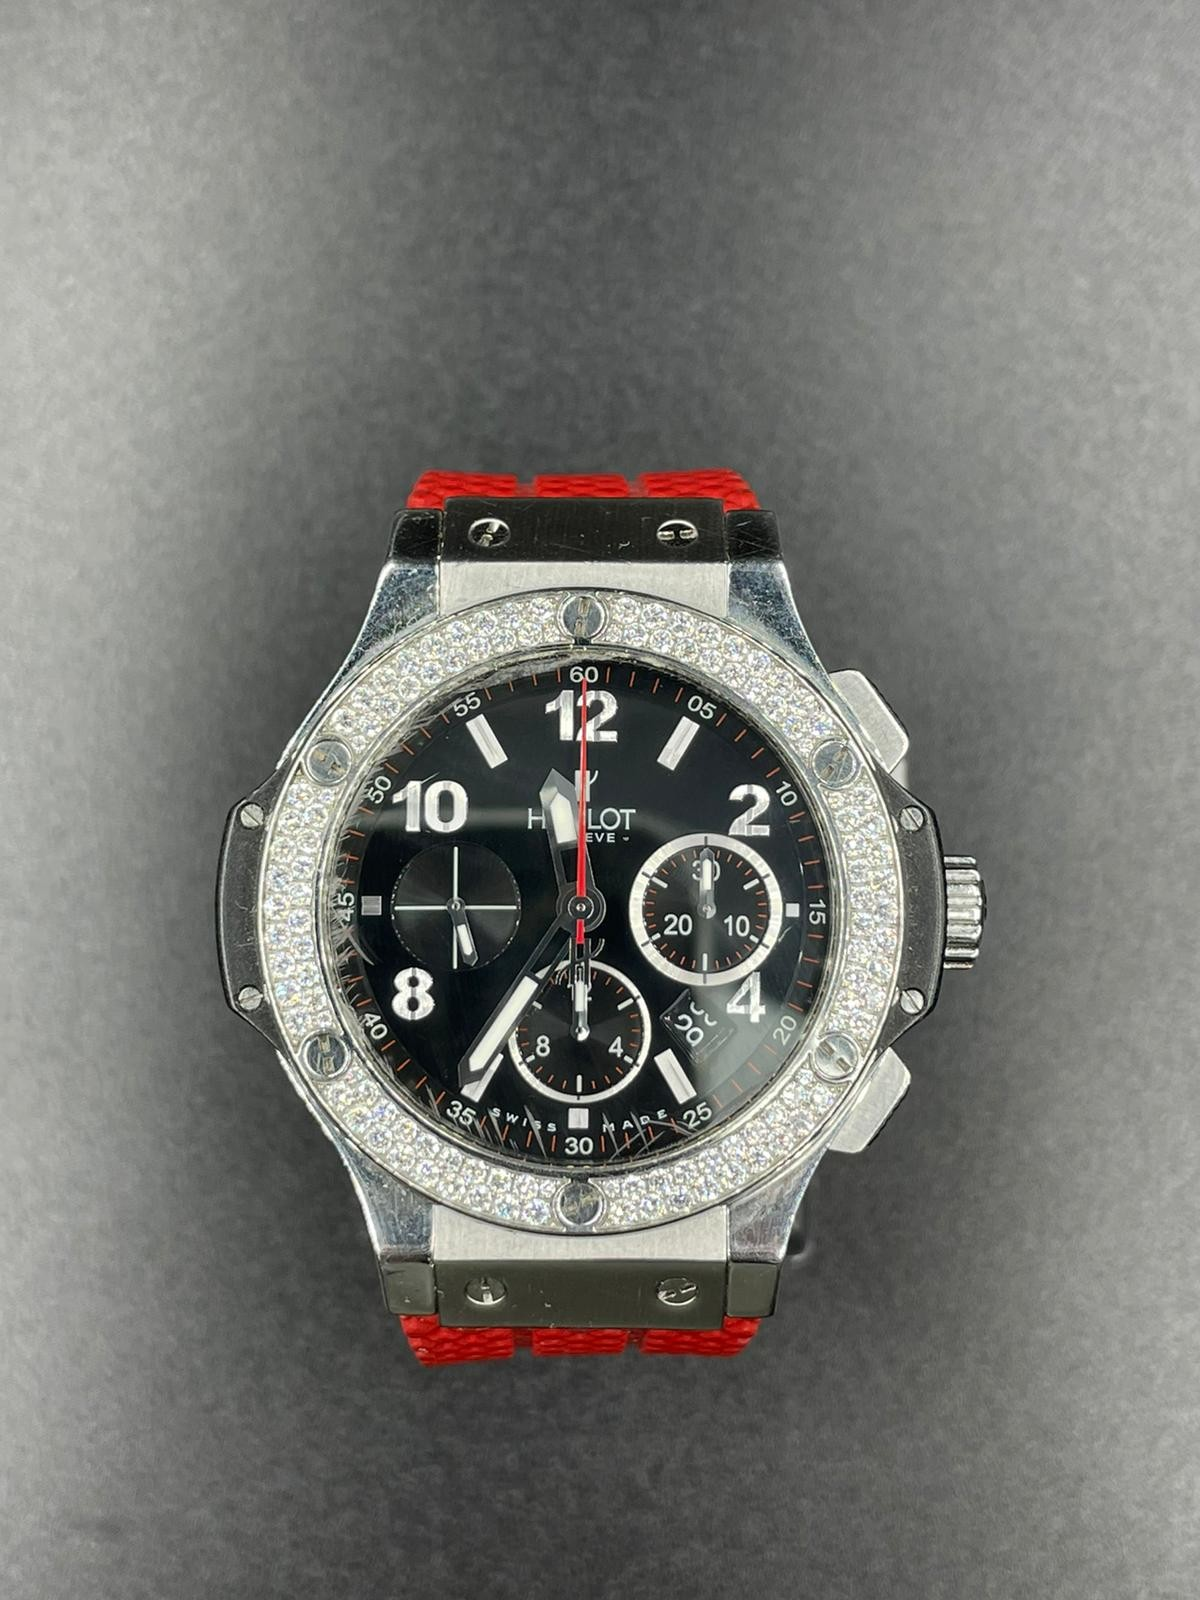 Hublot Big Bang chronometer watch with black face and original diamond dial - Image 2 of 5